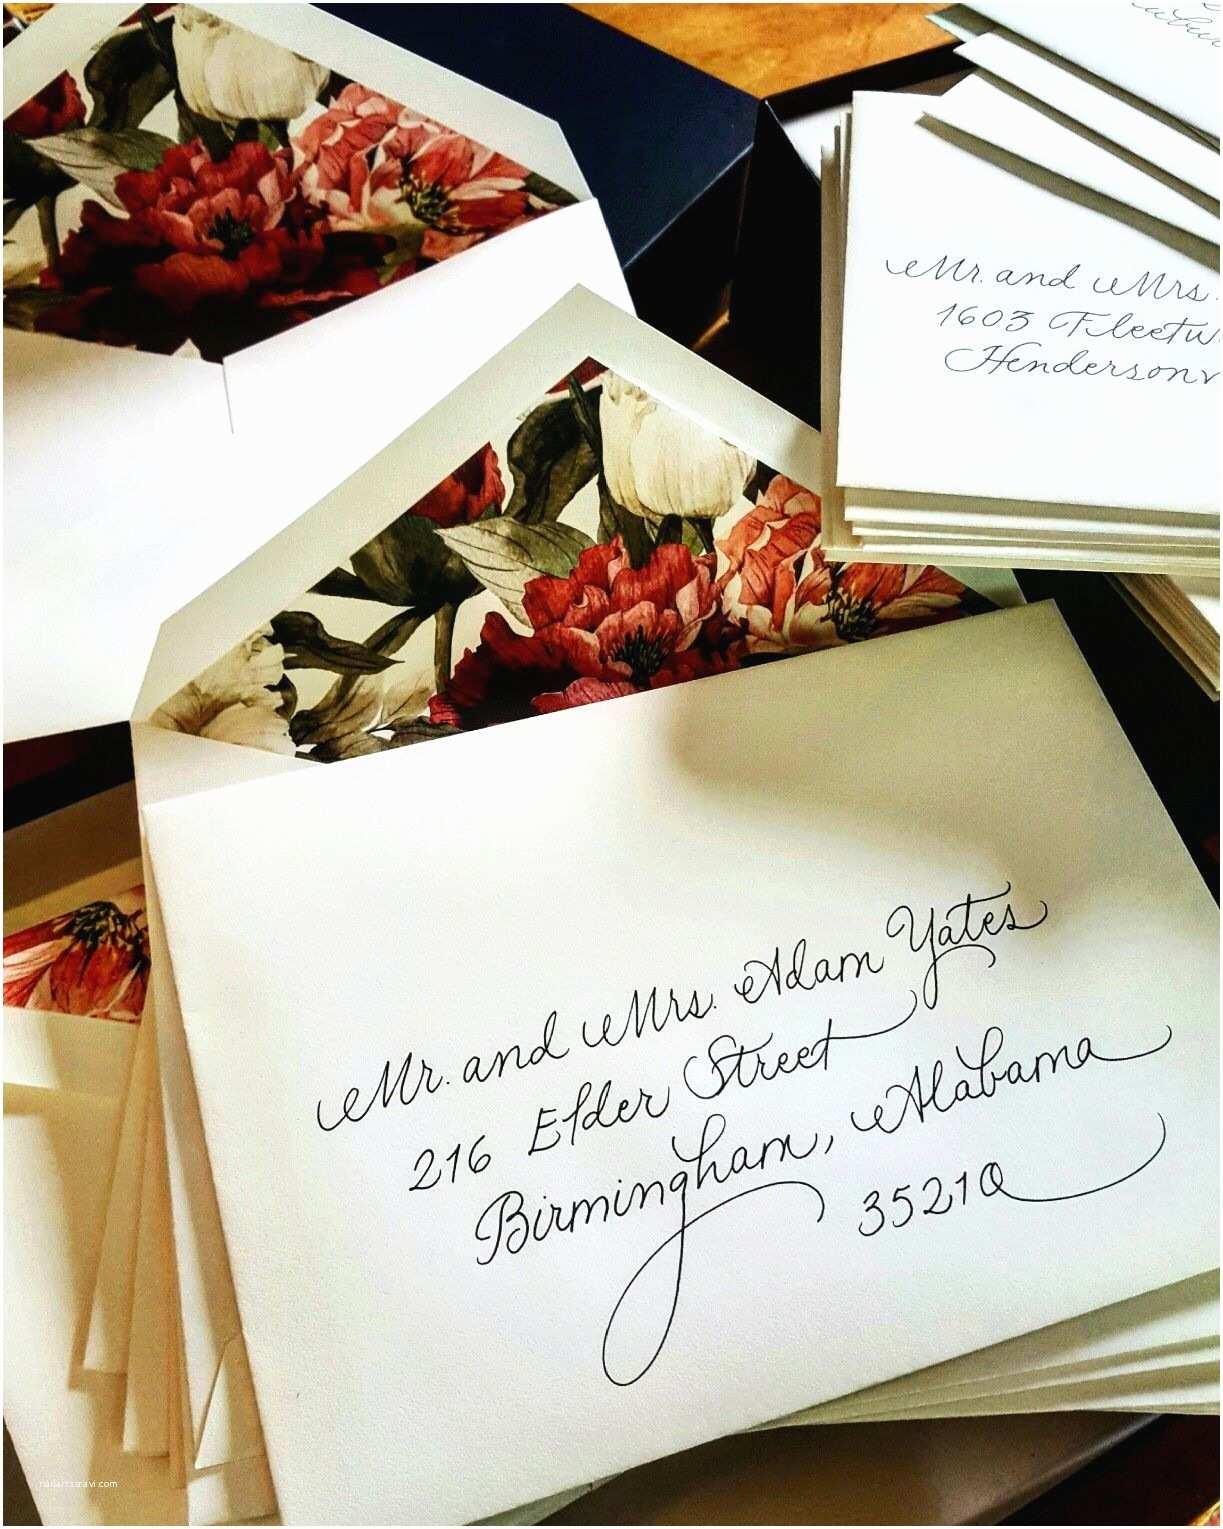 Crane and Co Wedding Invitations Beautiful Crane & Pany Wedding Invitation Envelopes